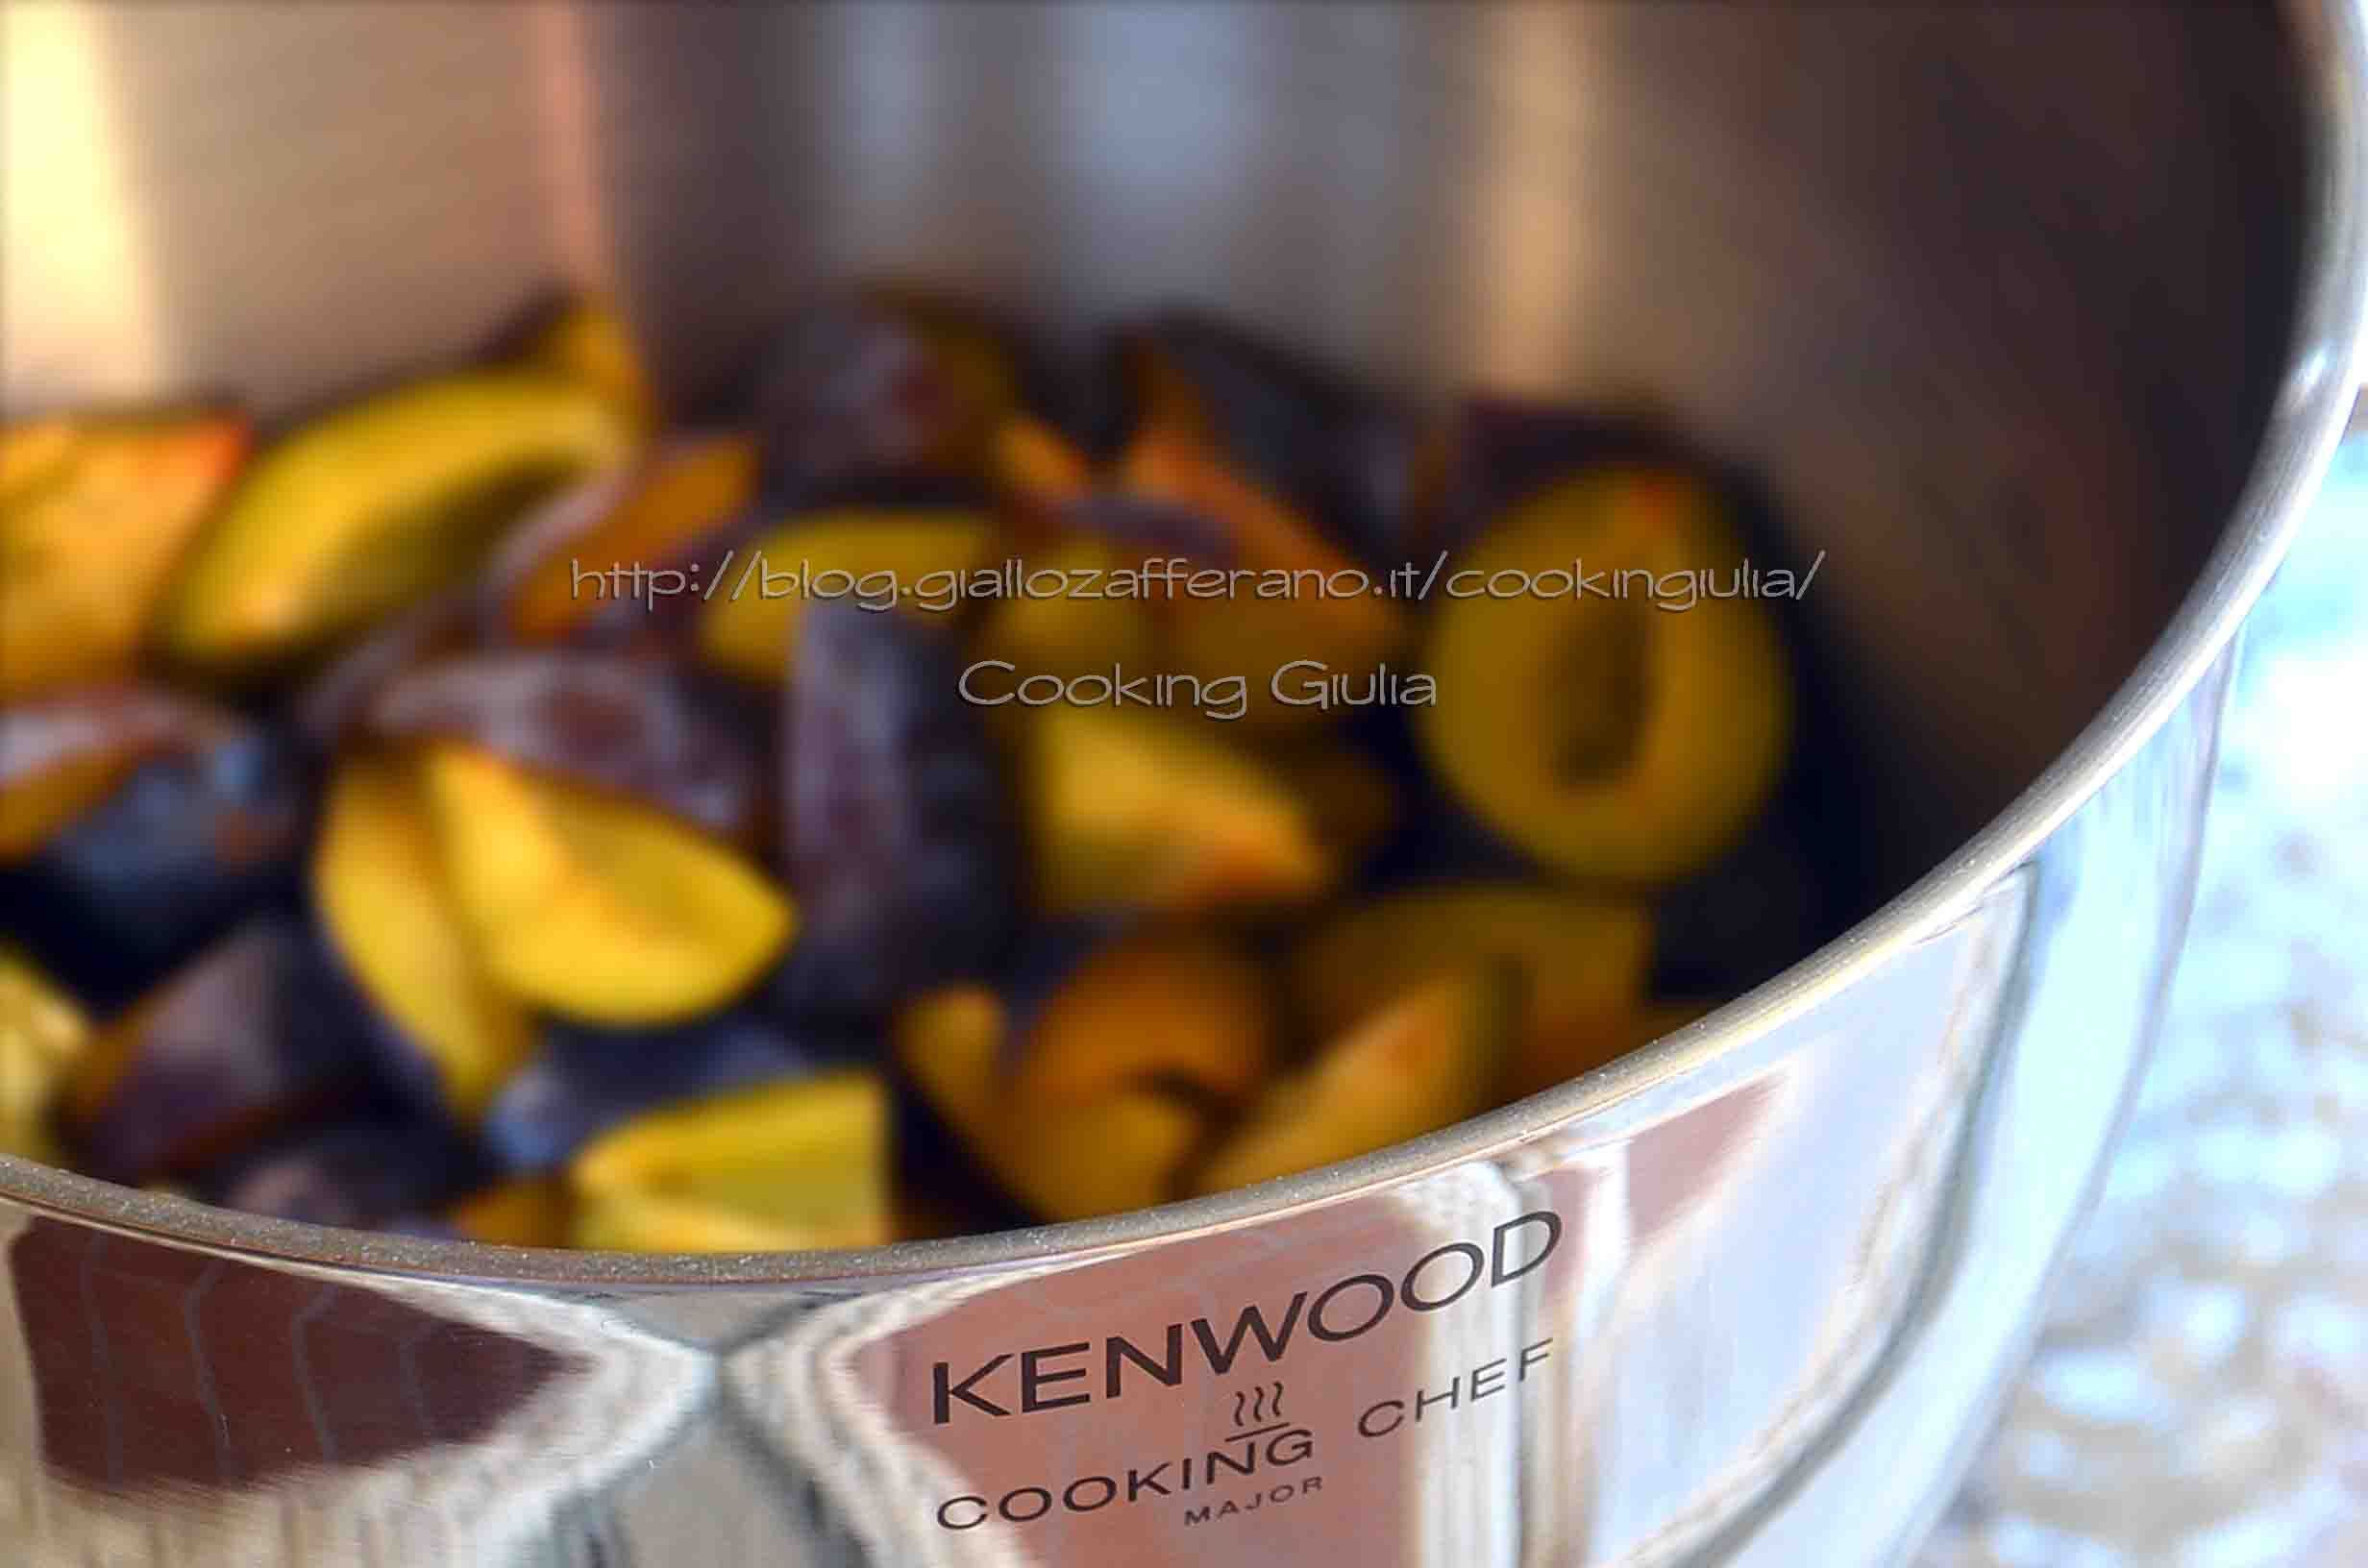 Marmellata Kenwood Cooking Chef   Ricette, Ricette dello